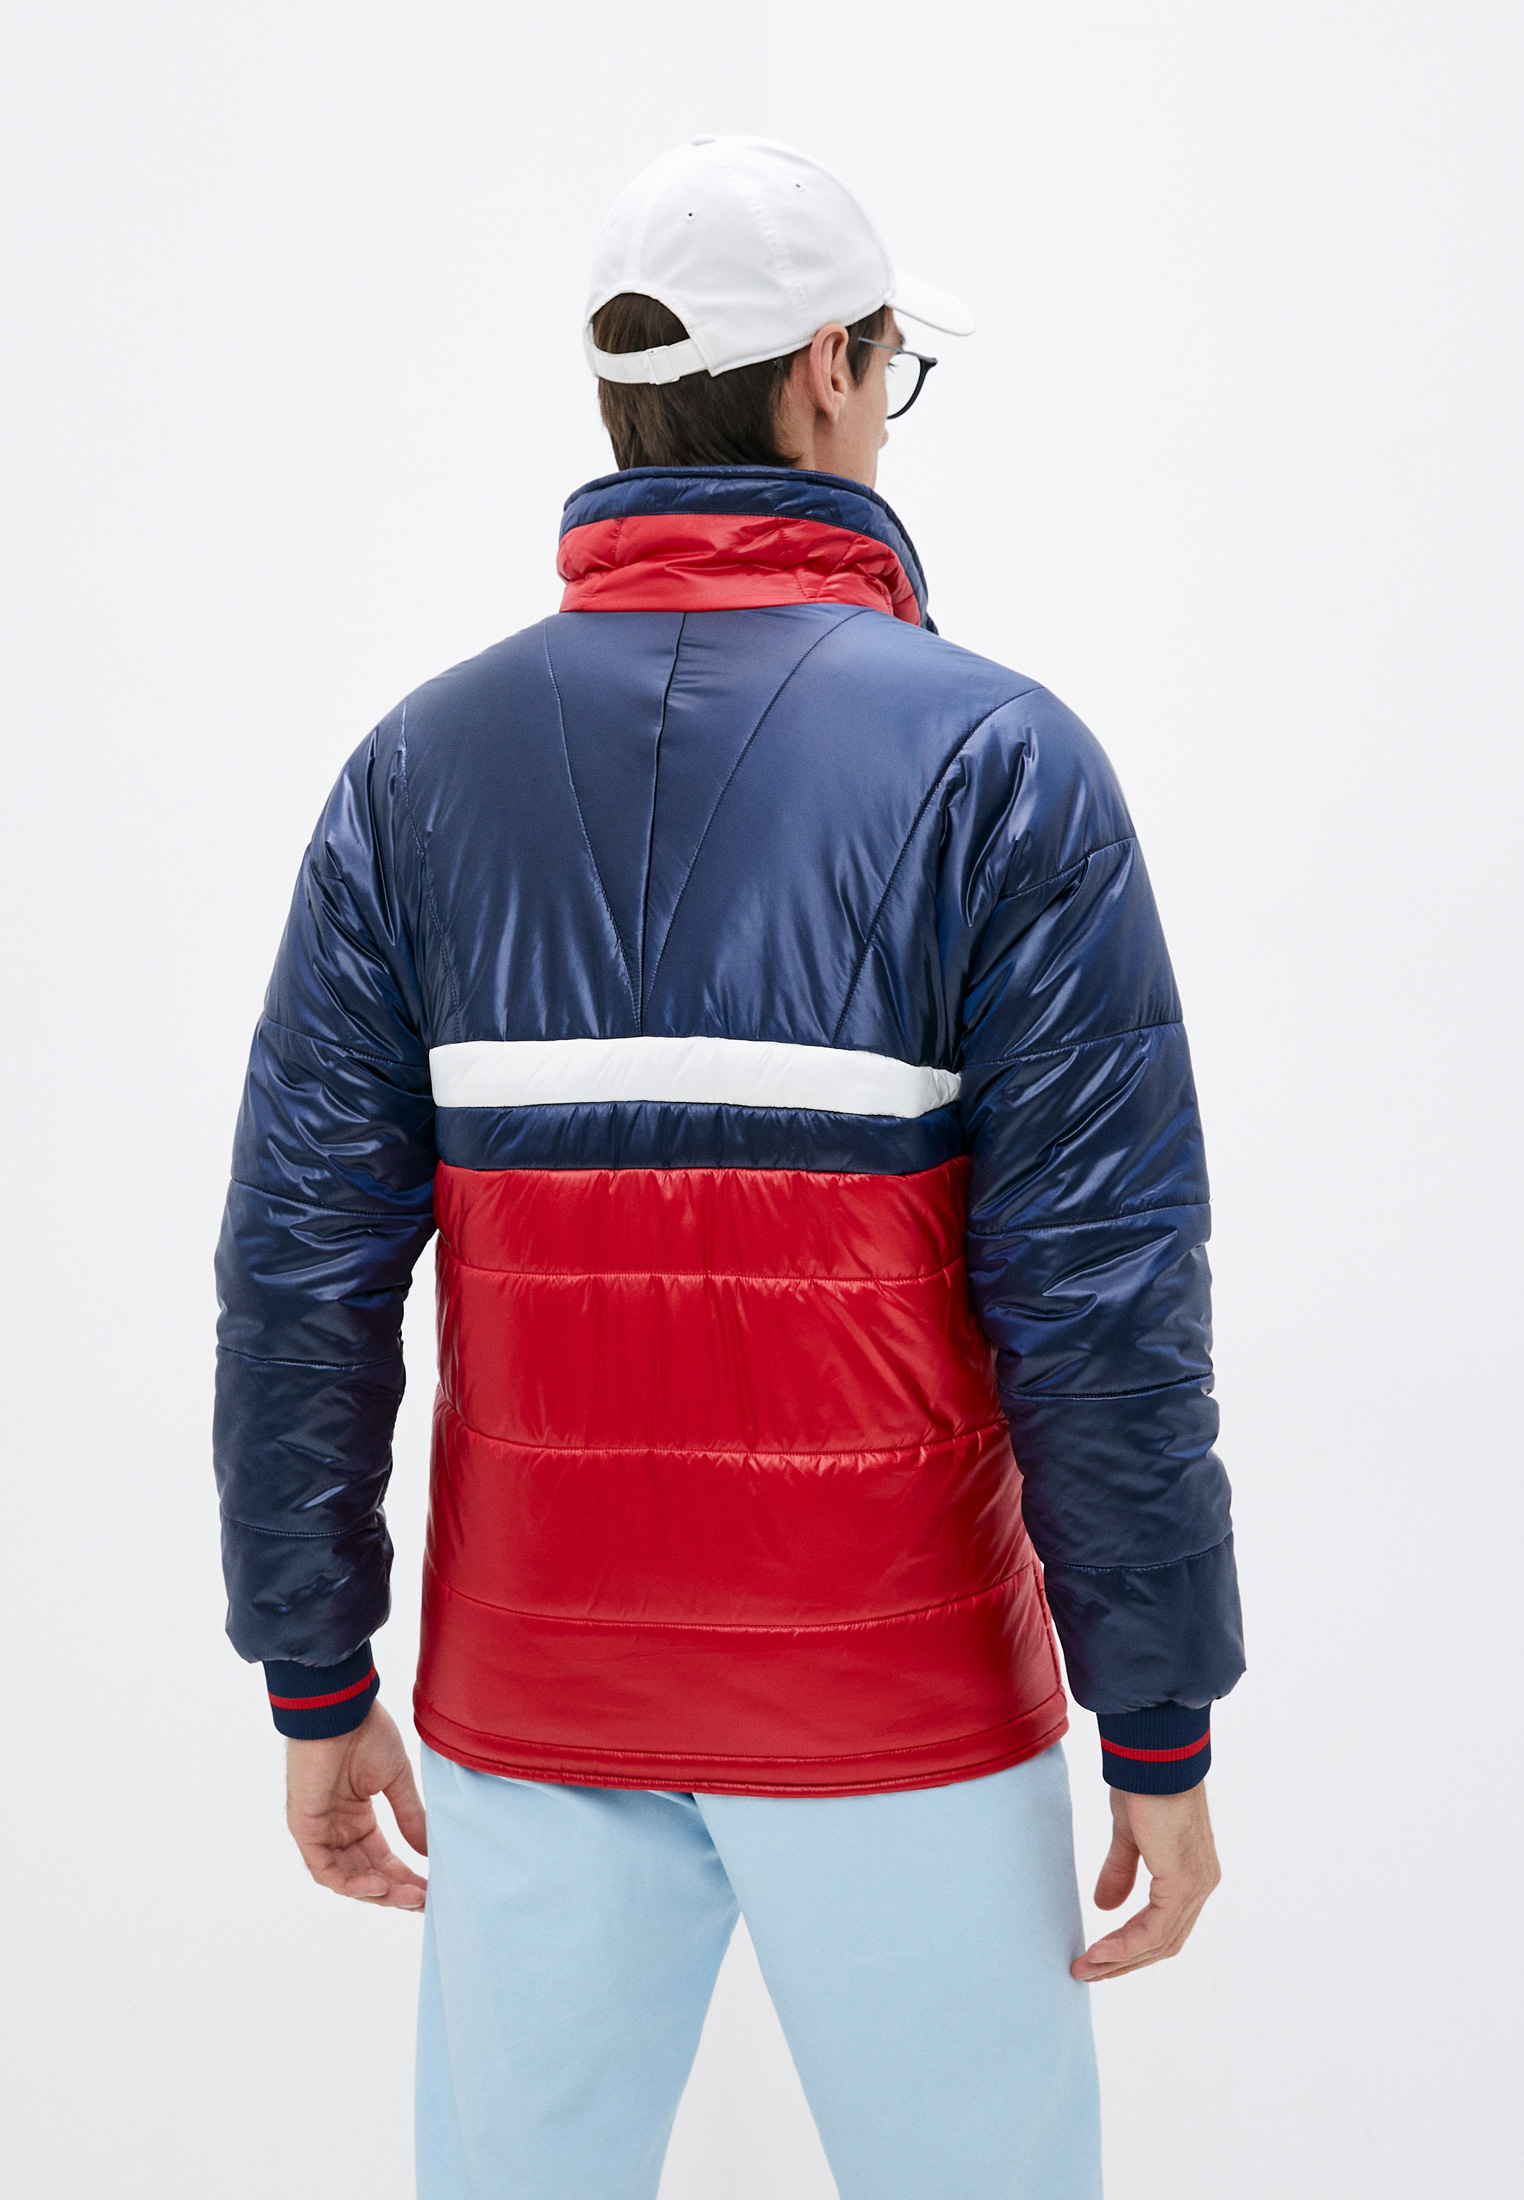 Мужская куртка Bikkembergs (Биккембергс) C H 090 00 T 9846: изображение 10